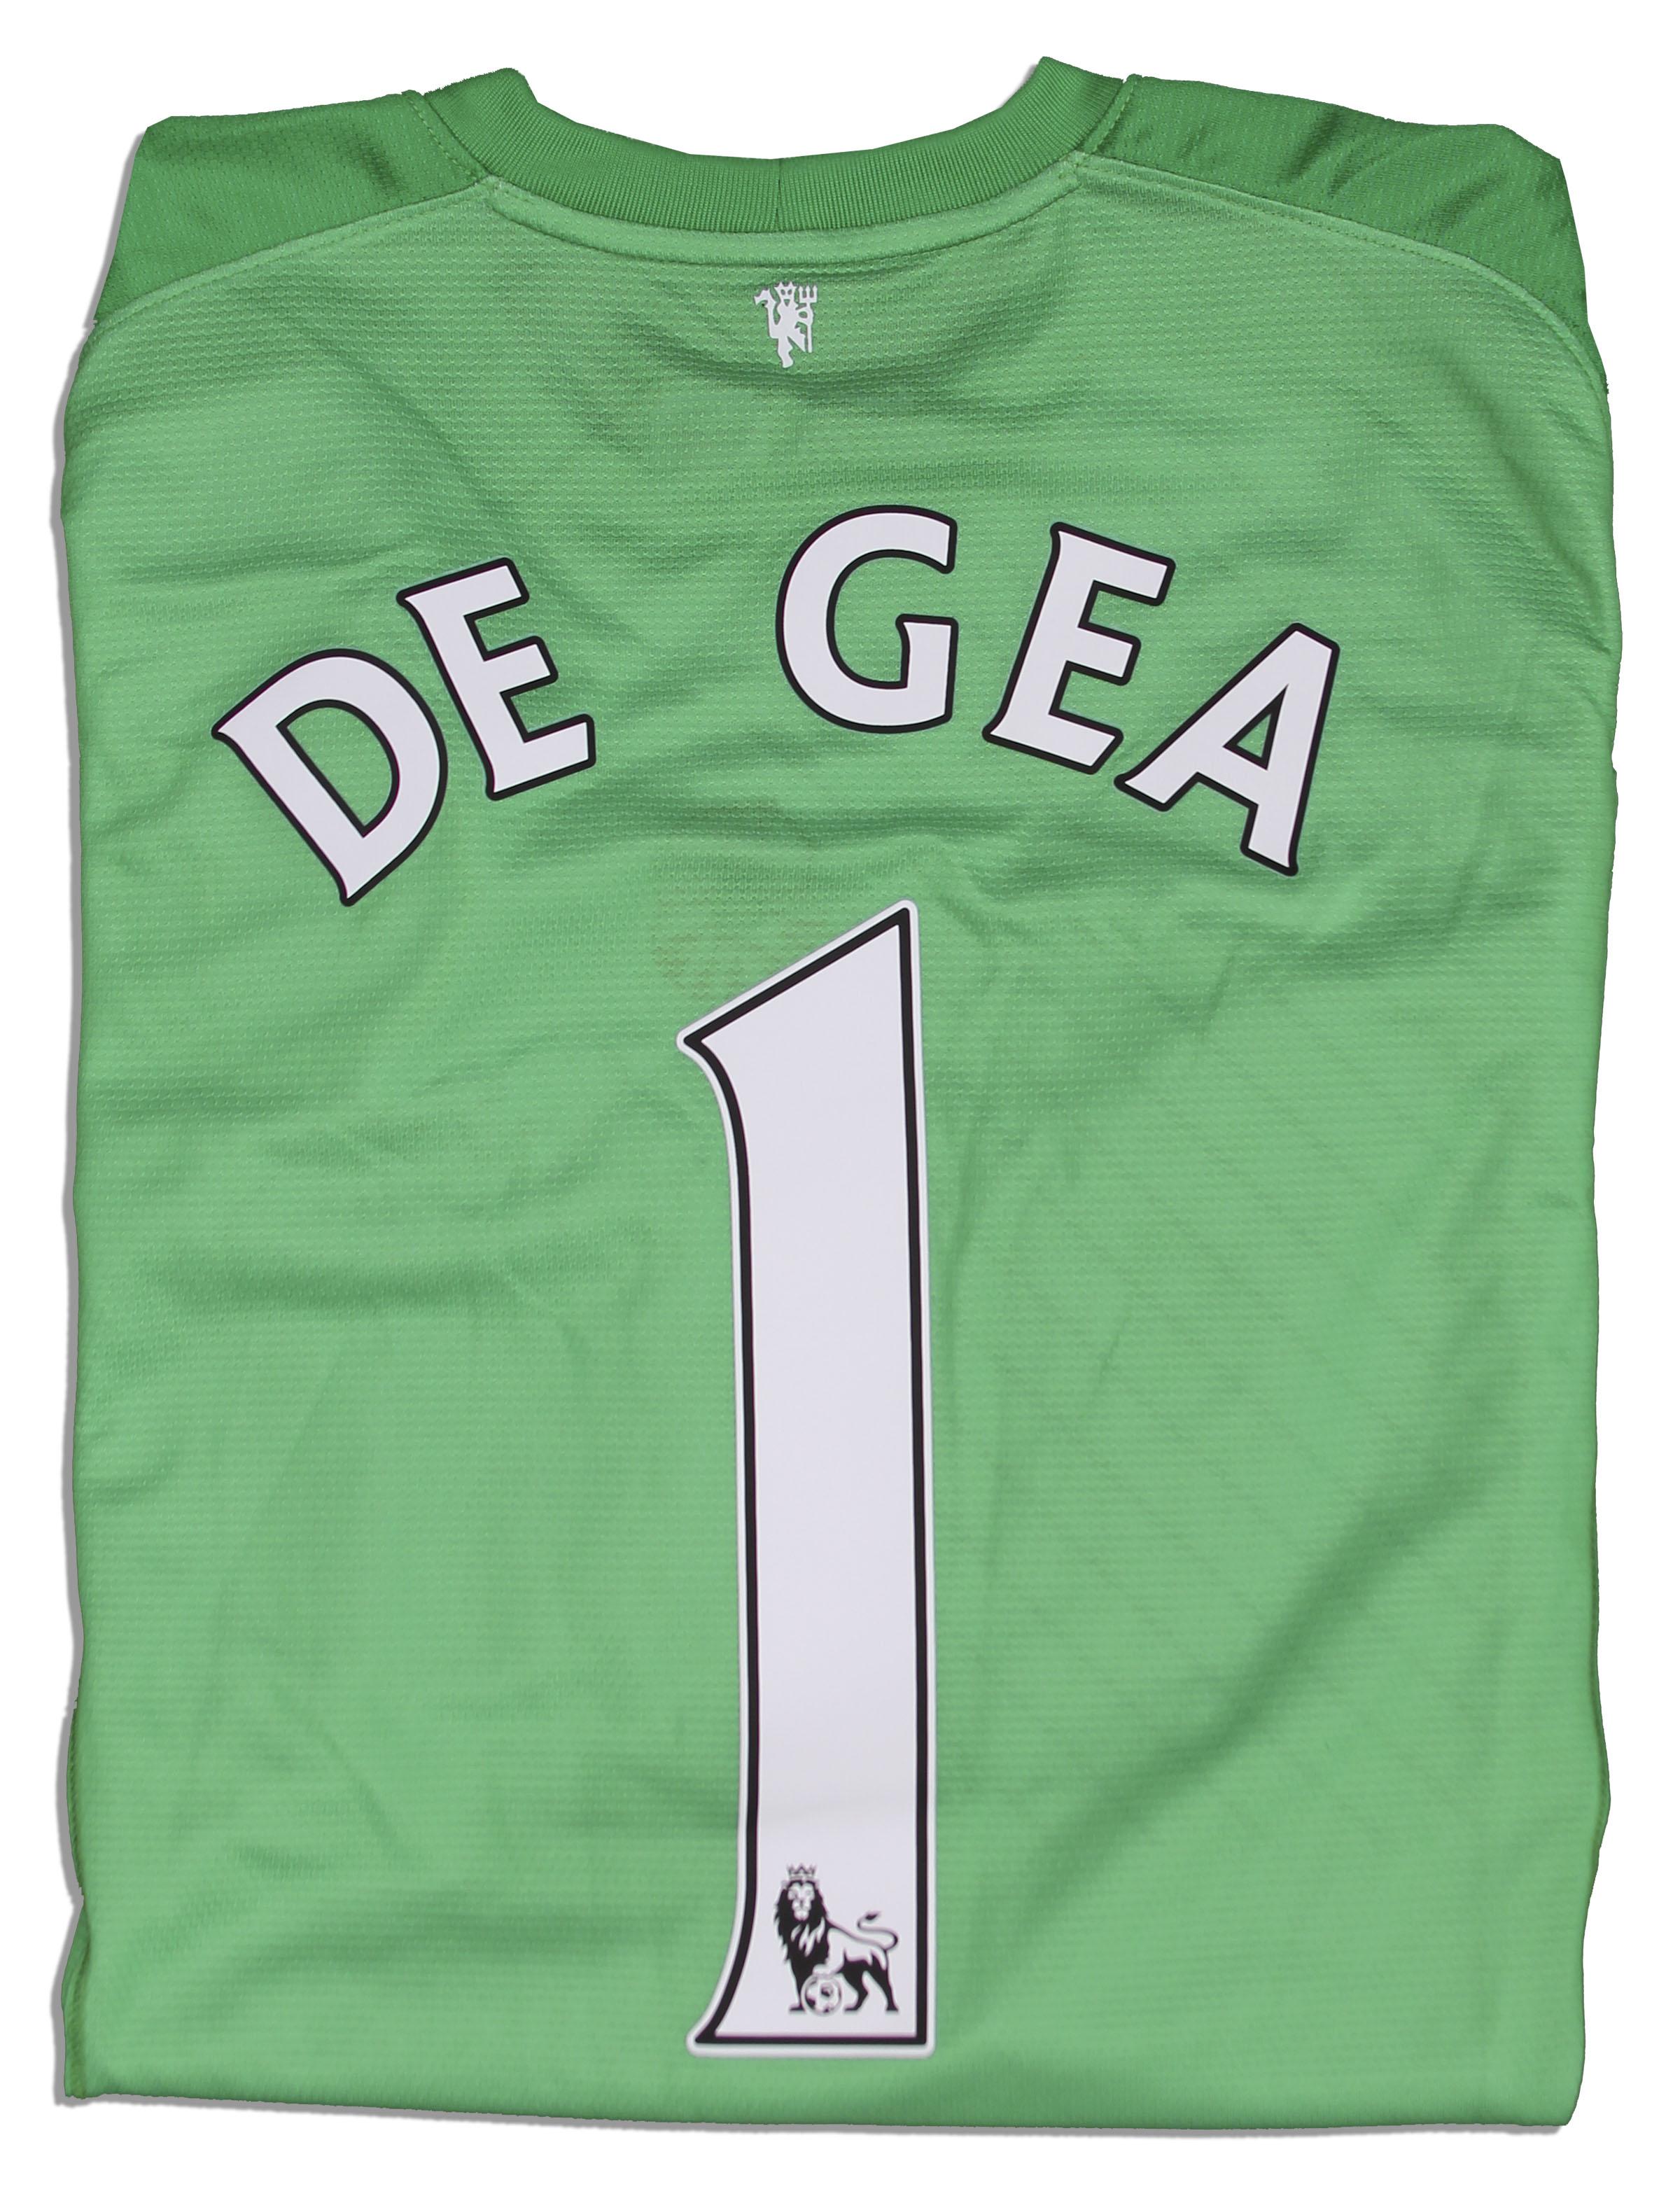 David DeGea Match Worn Manchester United Shirt Signed ... 98114dd90